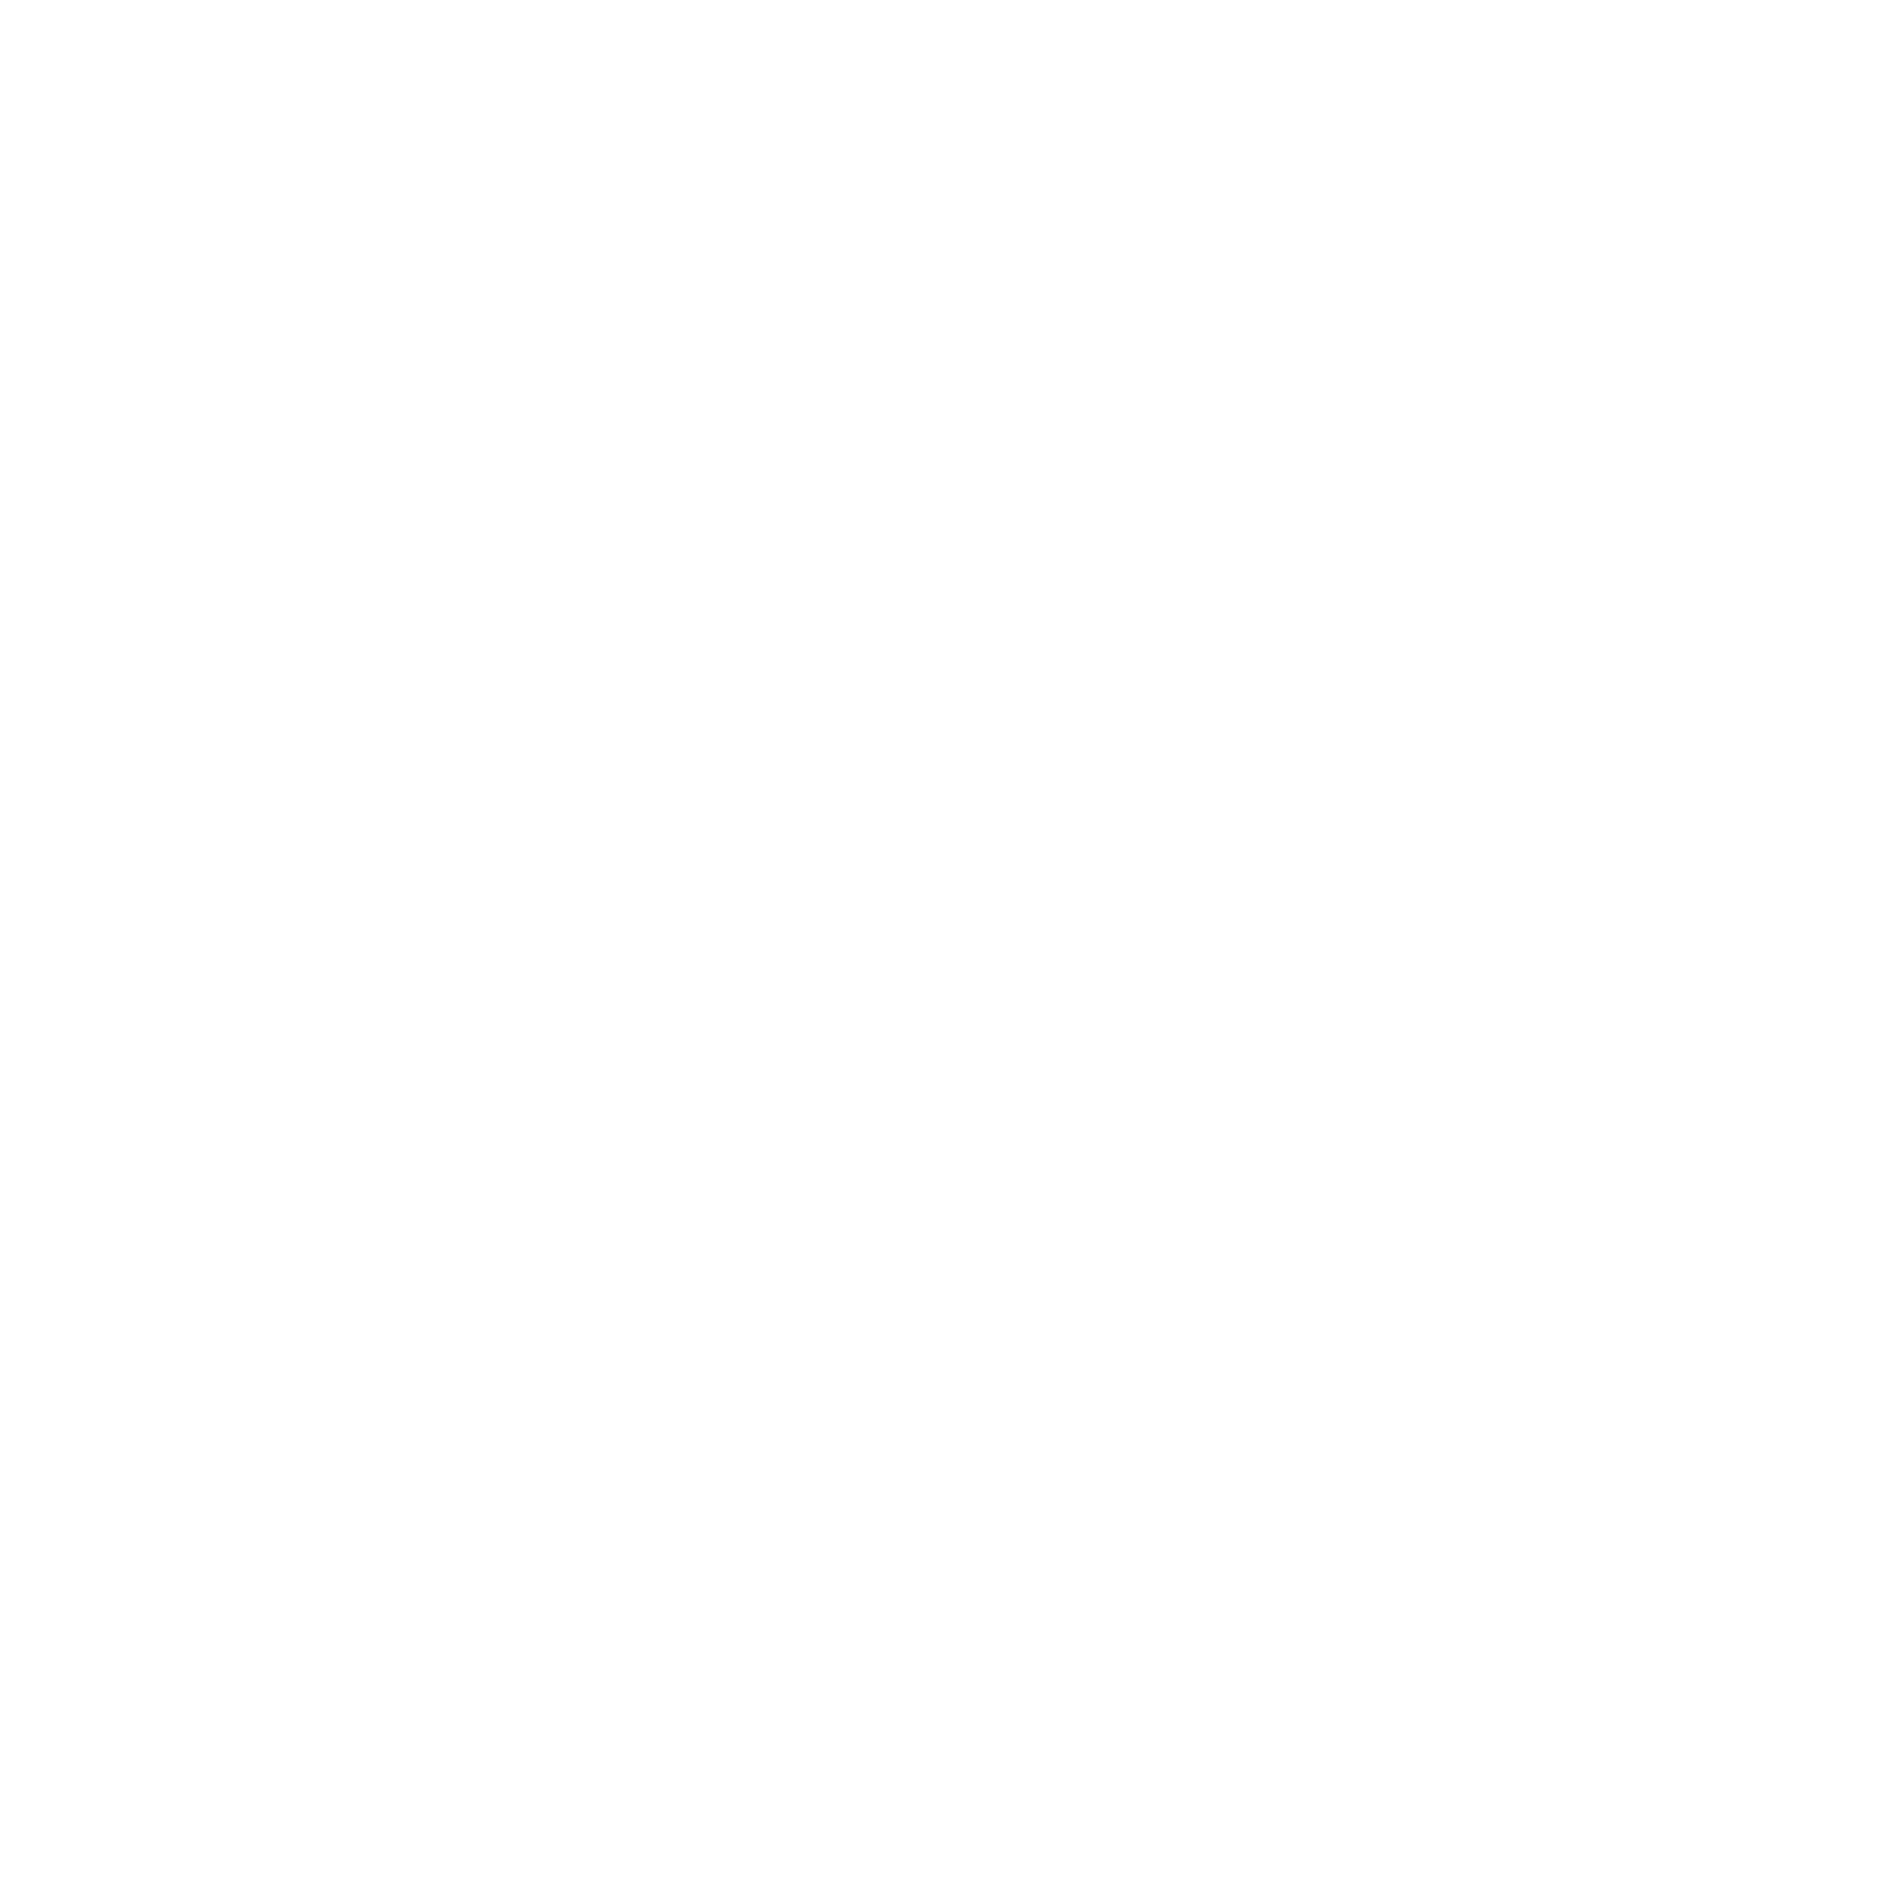 Personalcoach4u logo transparant